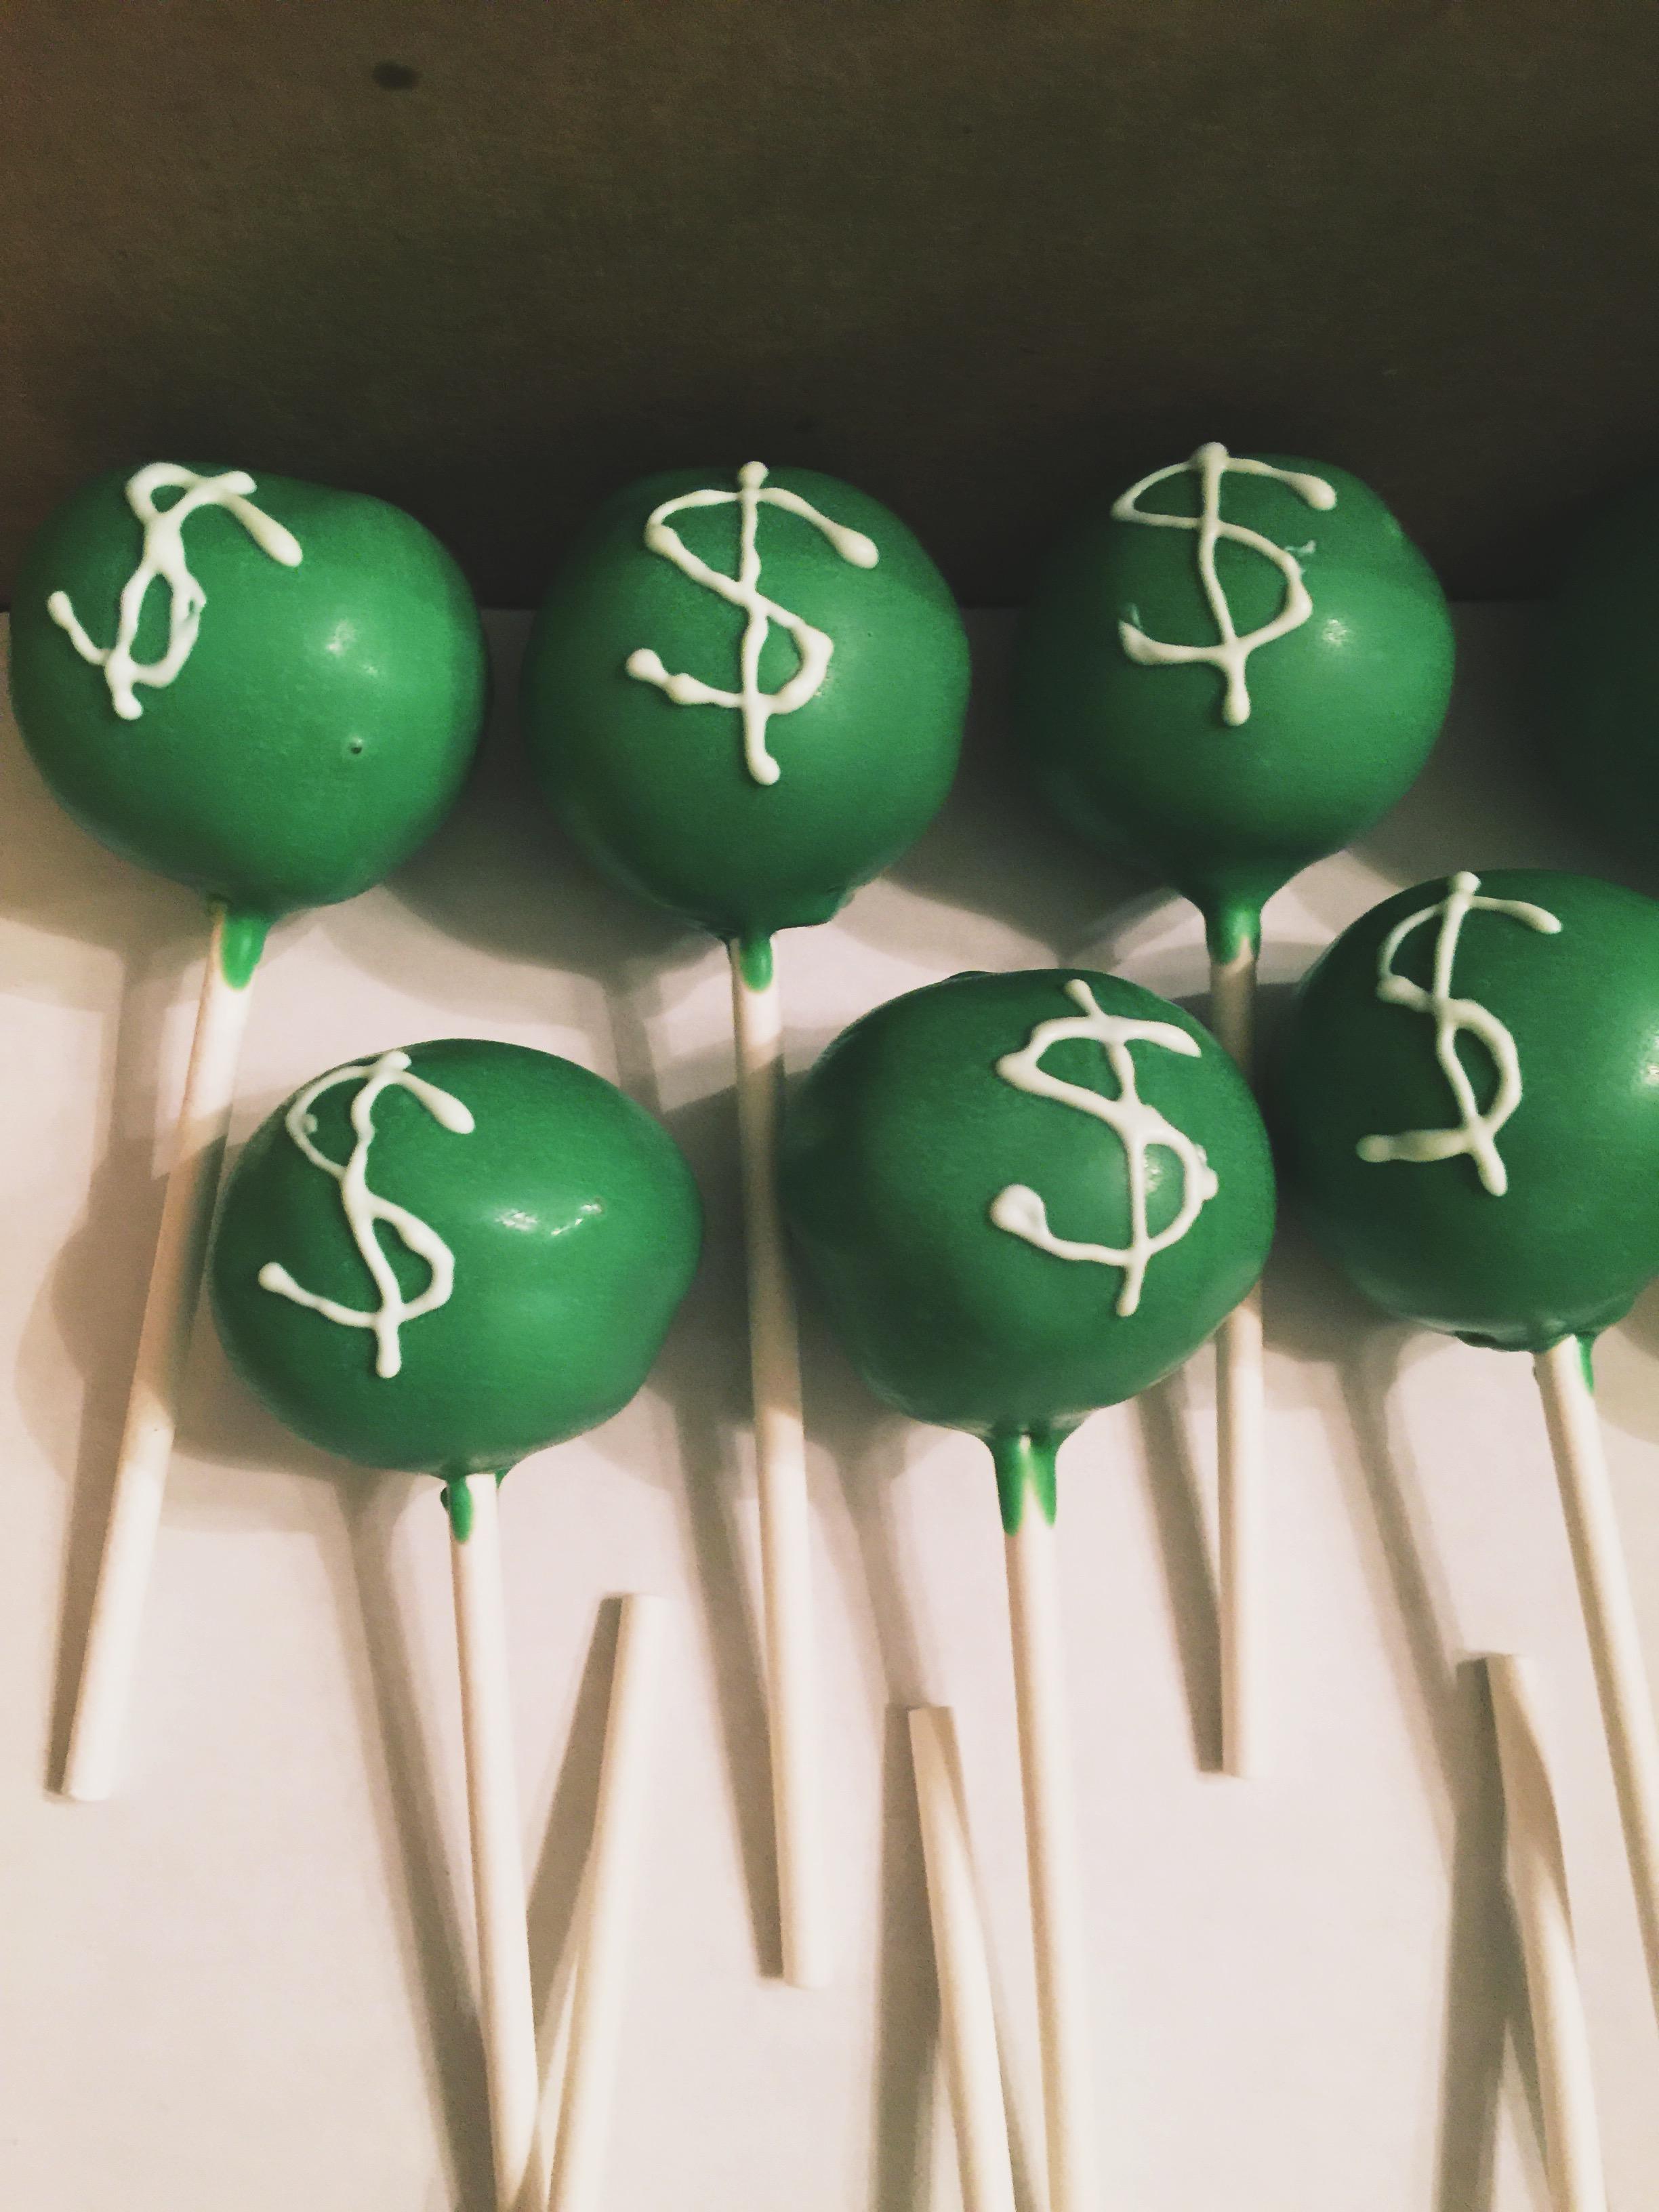 Financial Peace Cake Ball Dayton Ohio